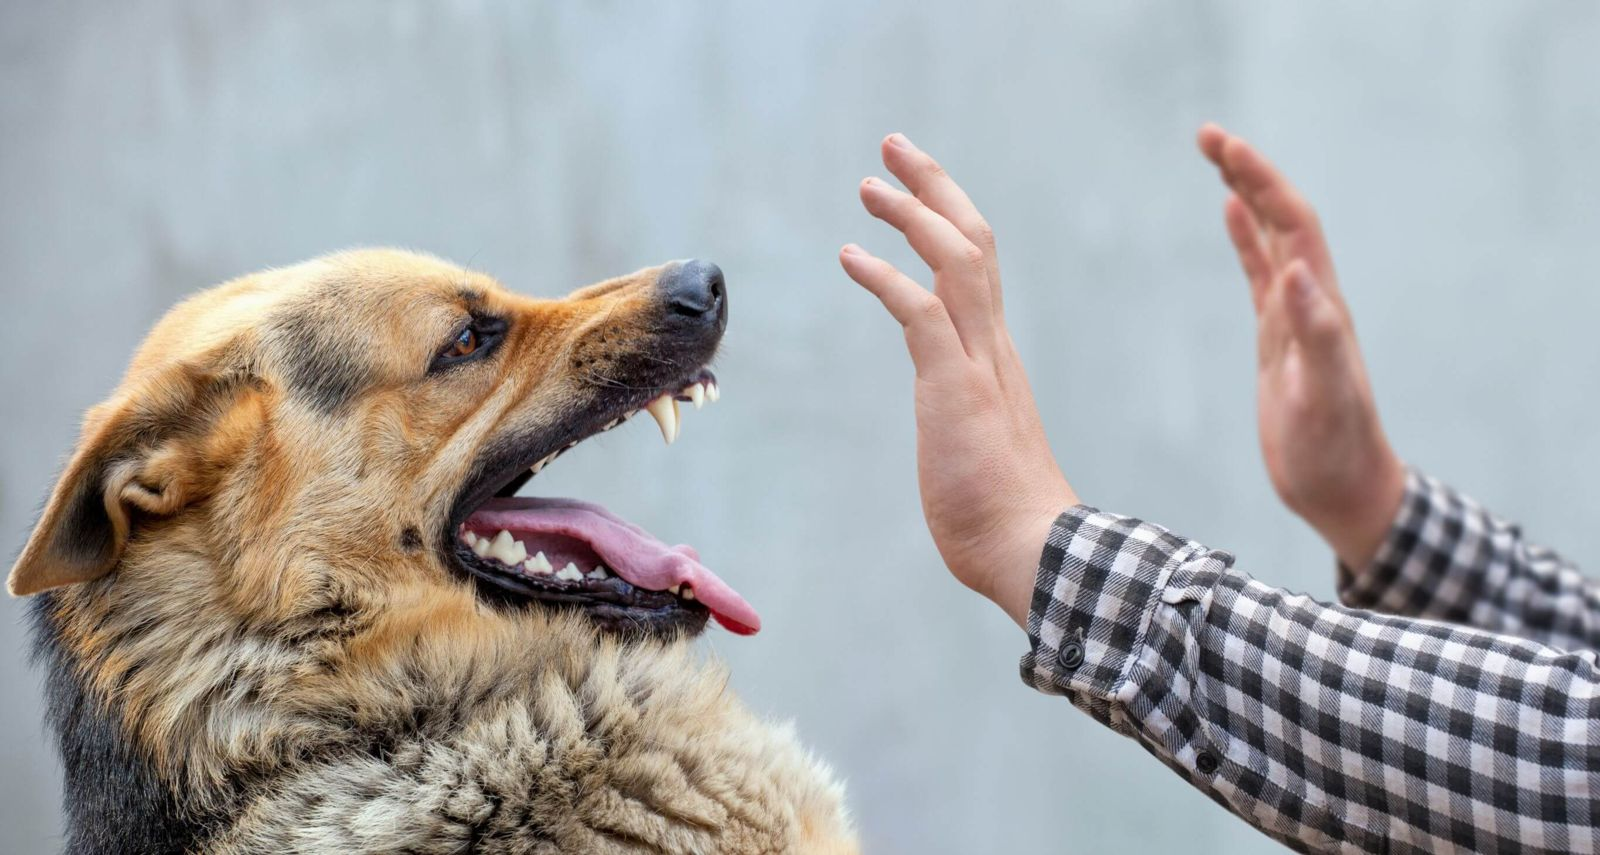 Umbrella-Insurance-For-Dog-Bites-Wisconsin